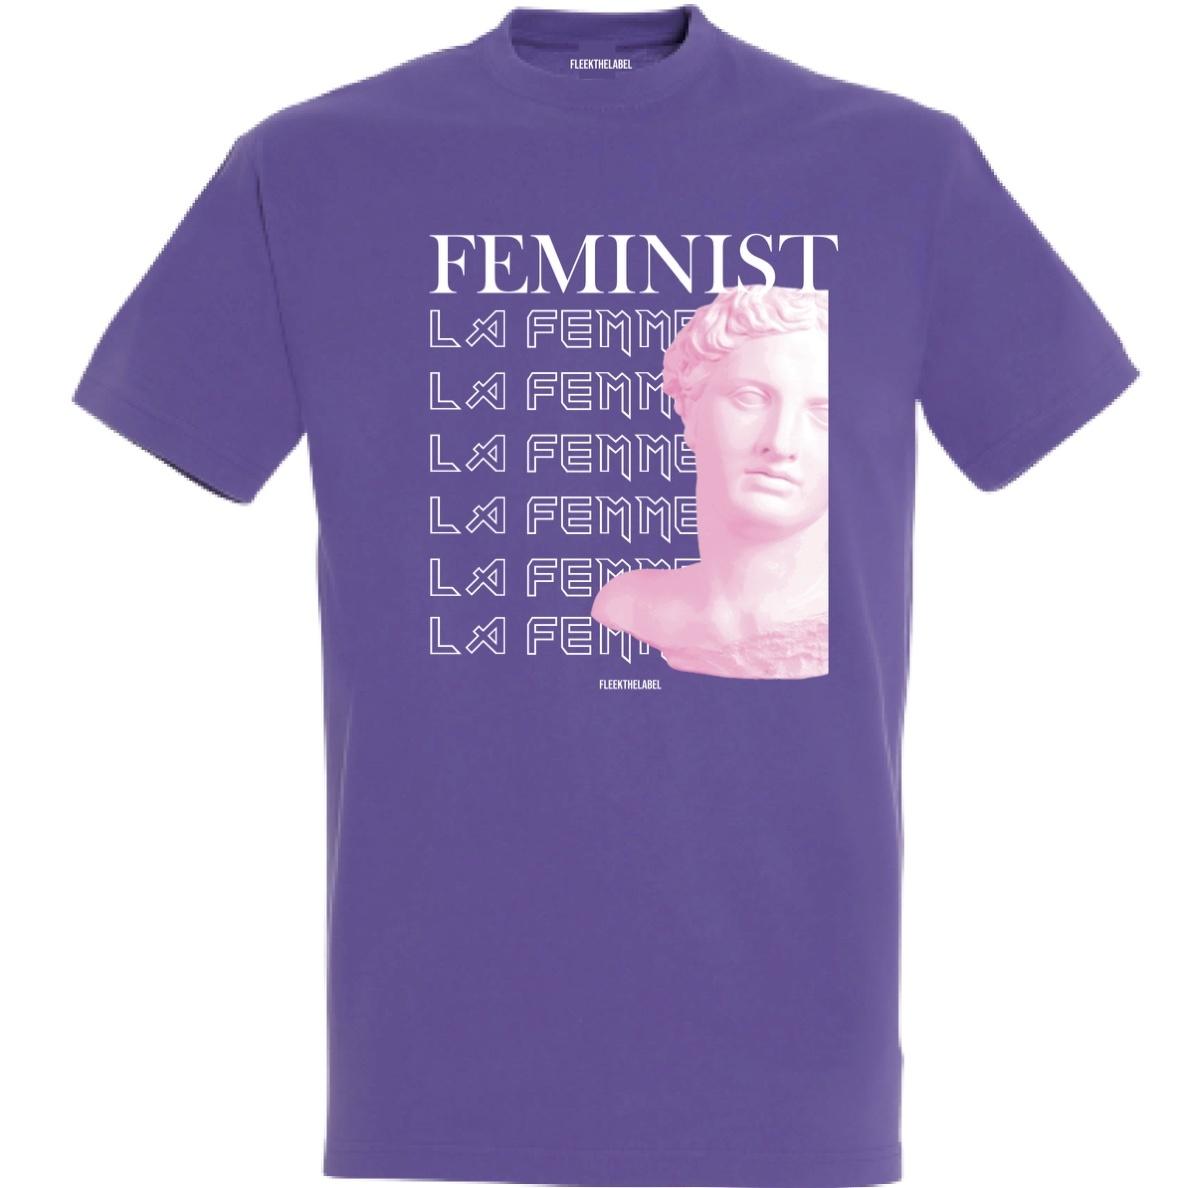 LA FEMME - PURPLE-1